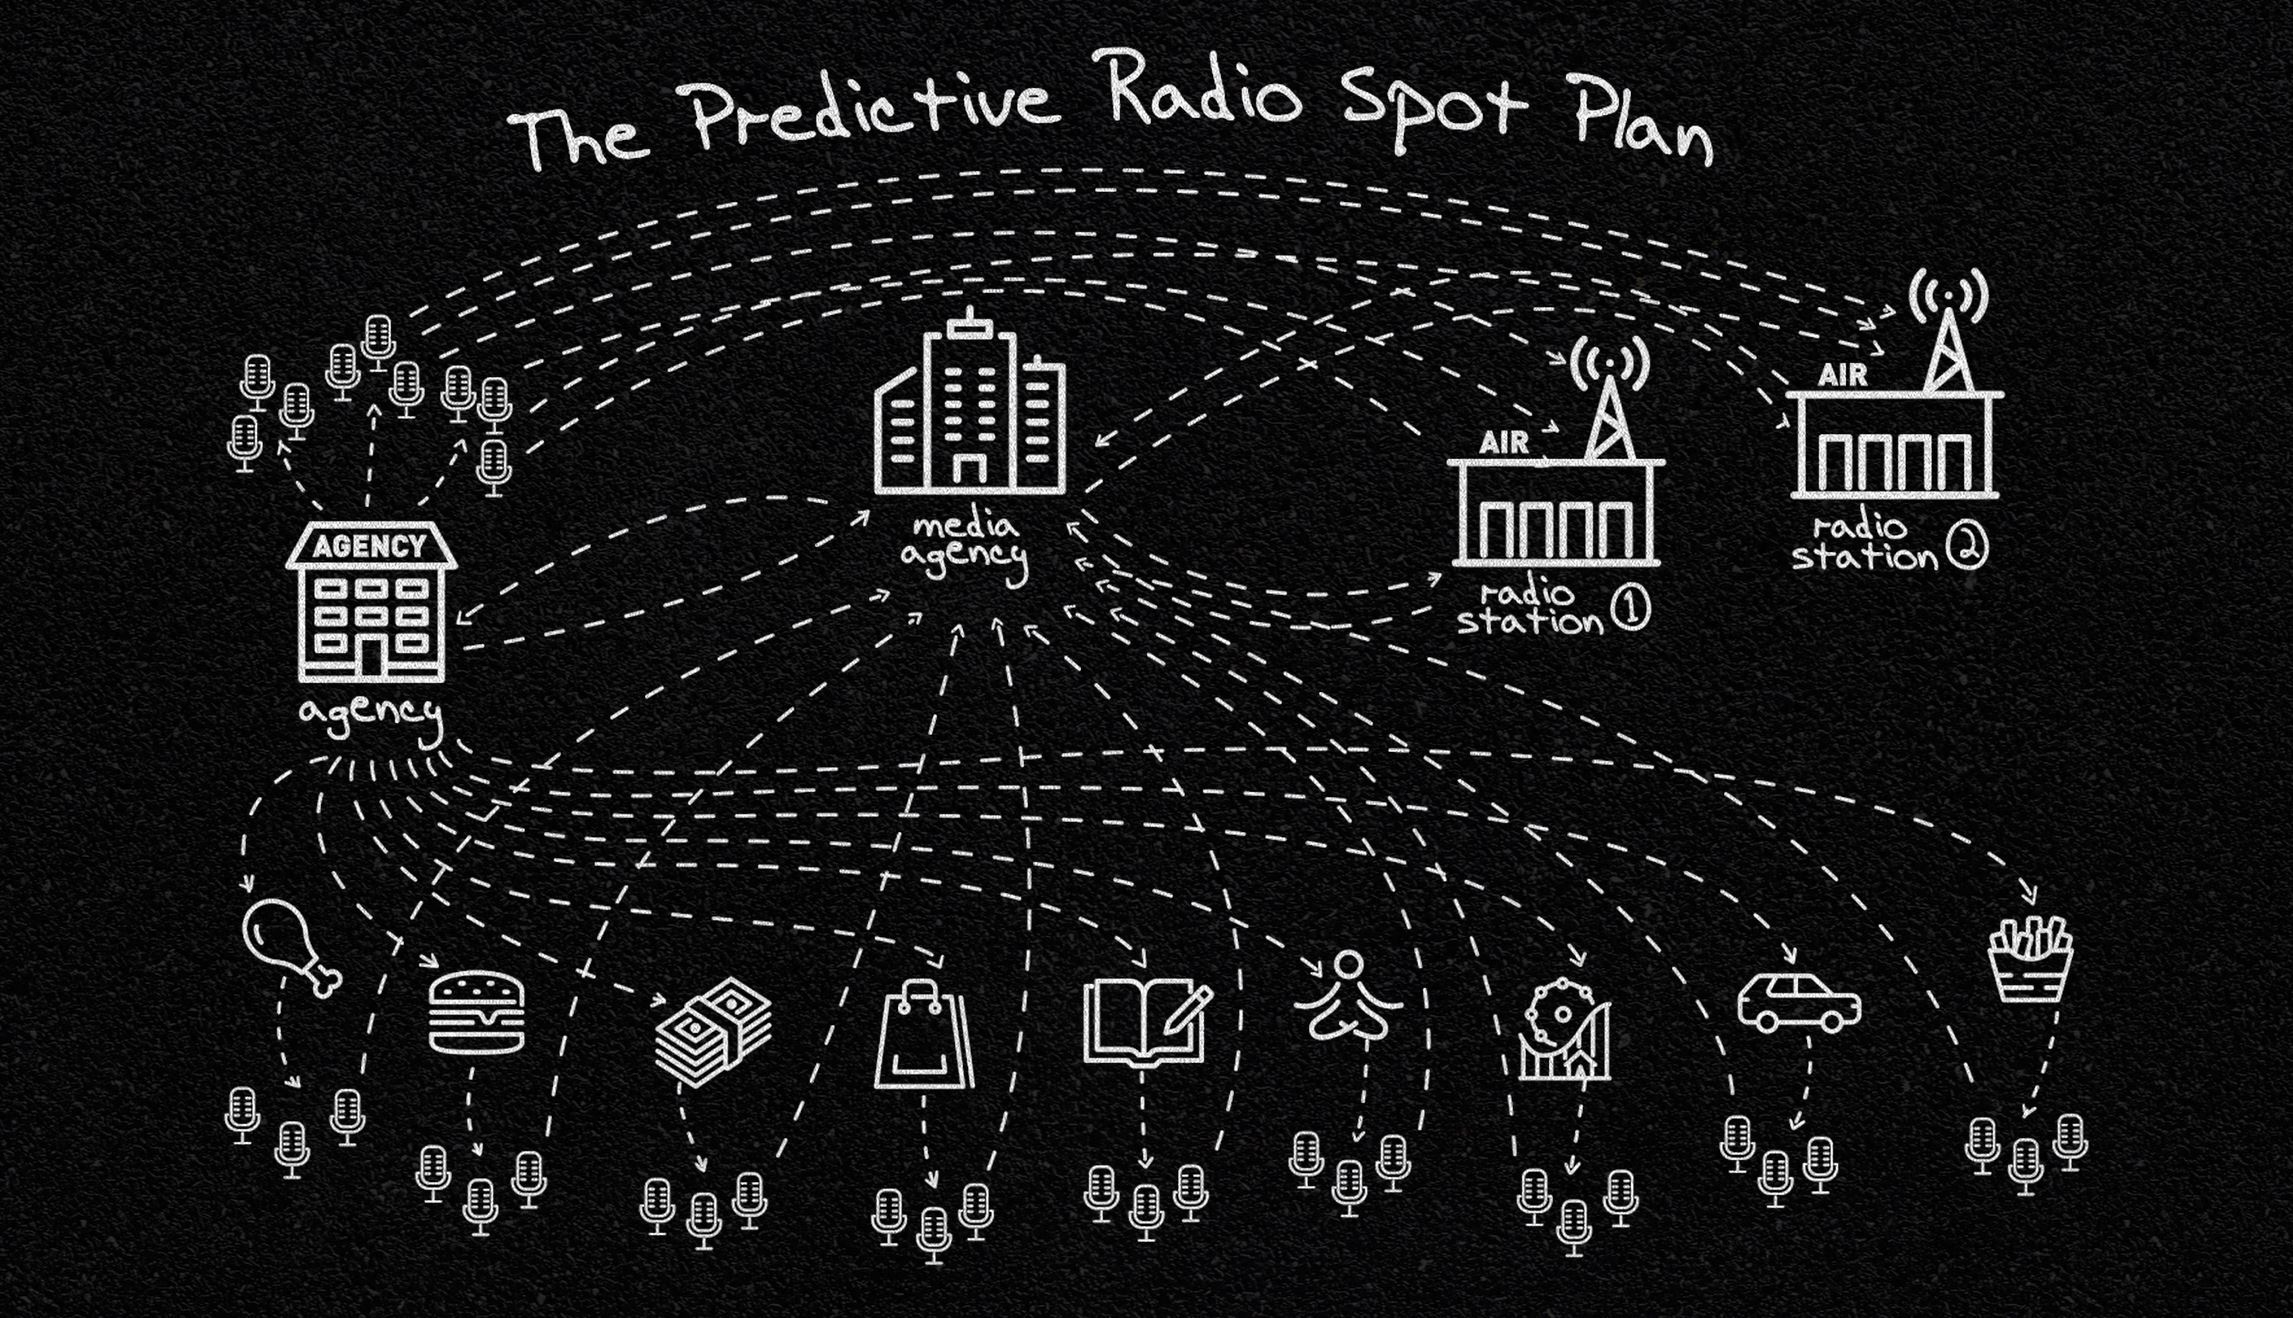 Predictive Radio Spots